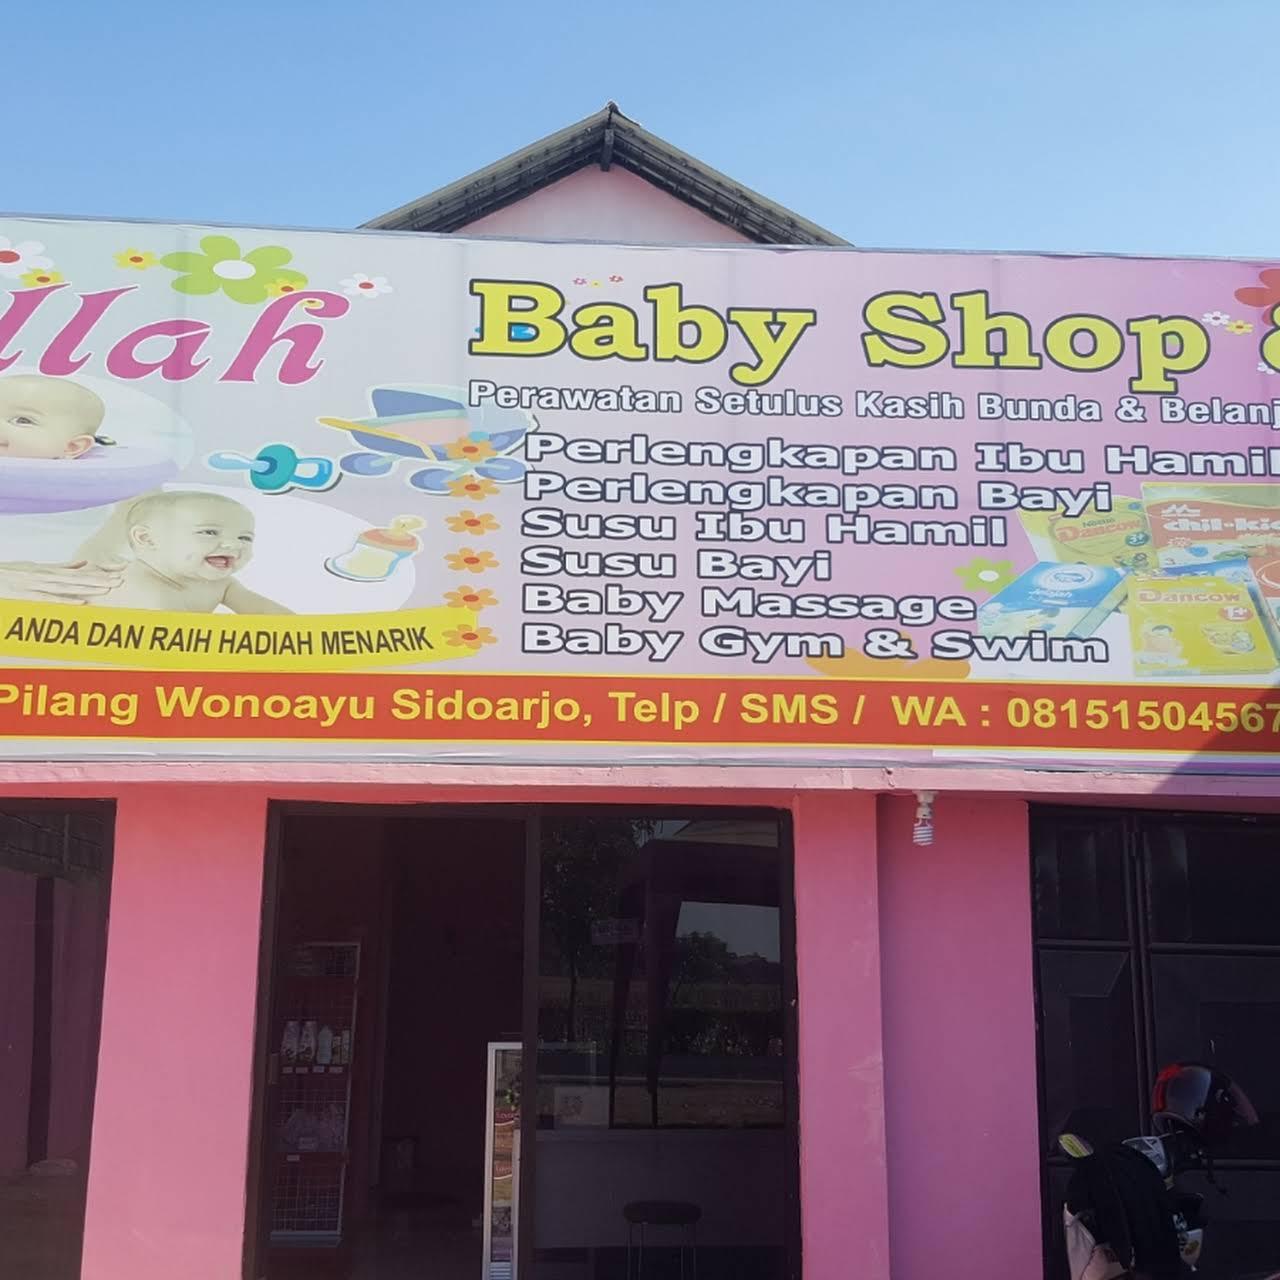 Contoh Desain Banner Baby Shop